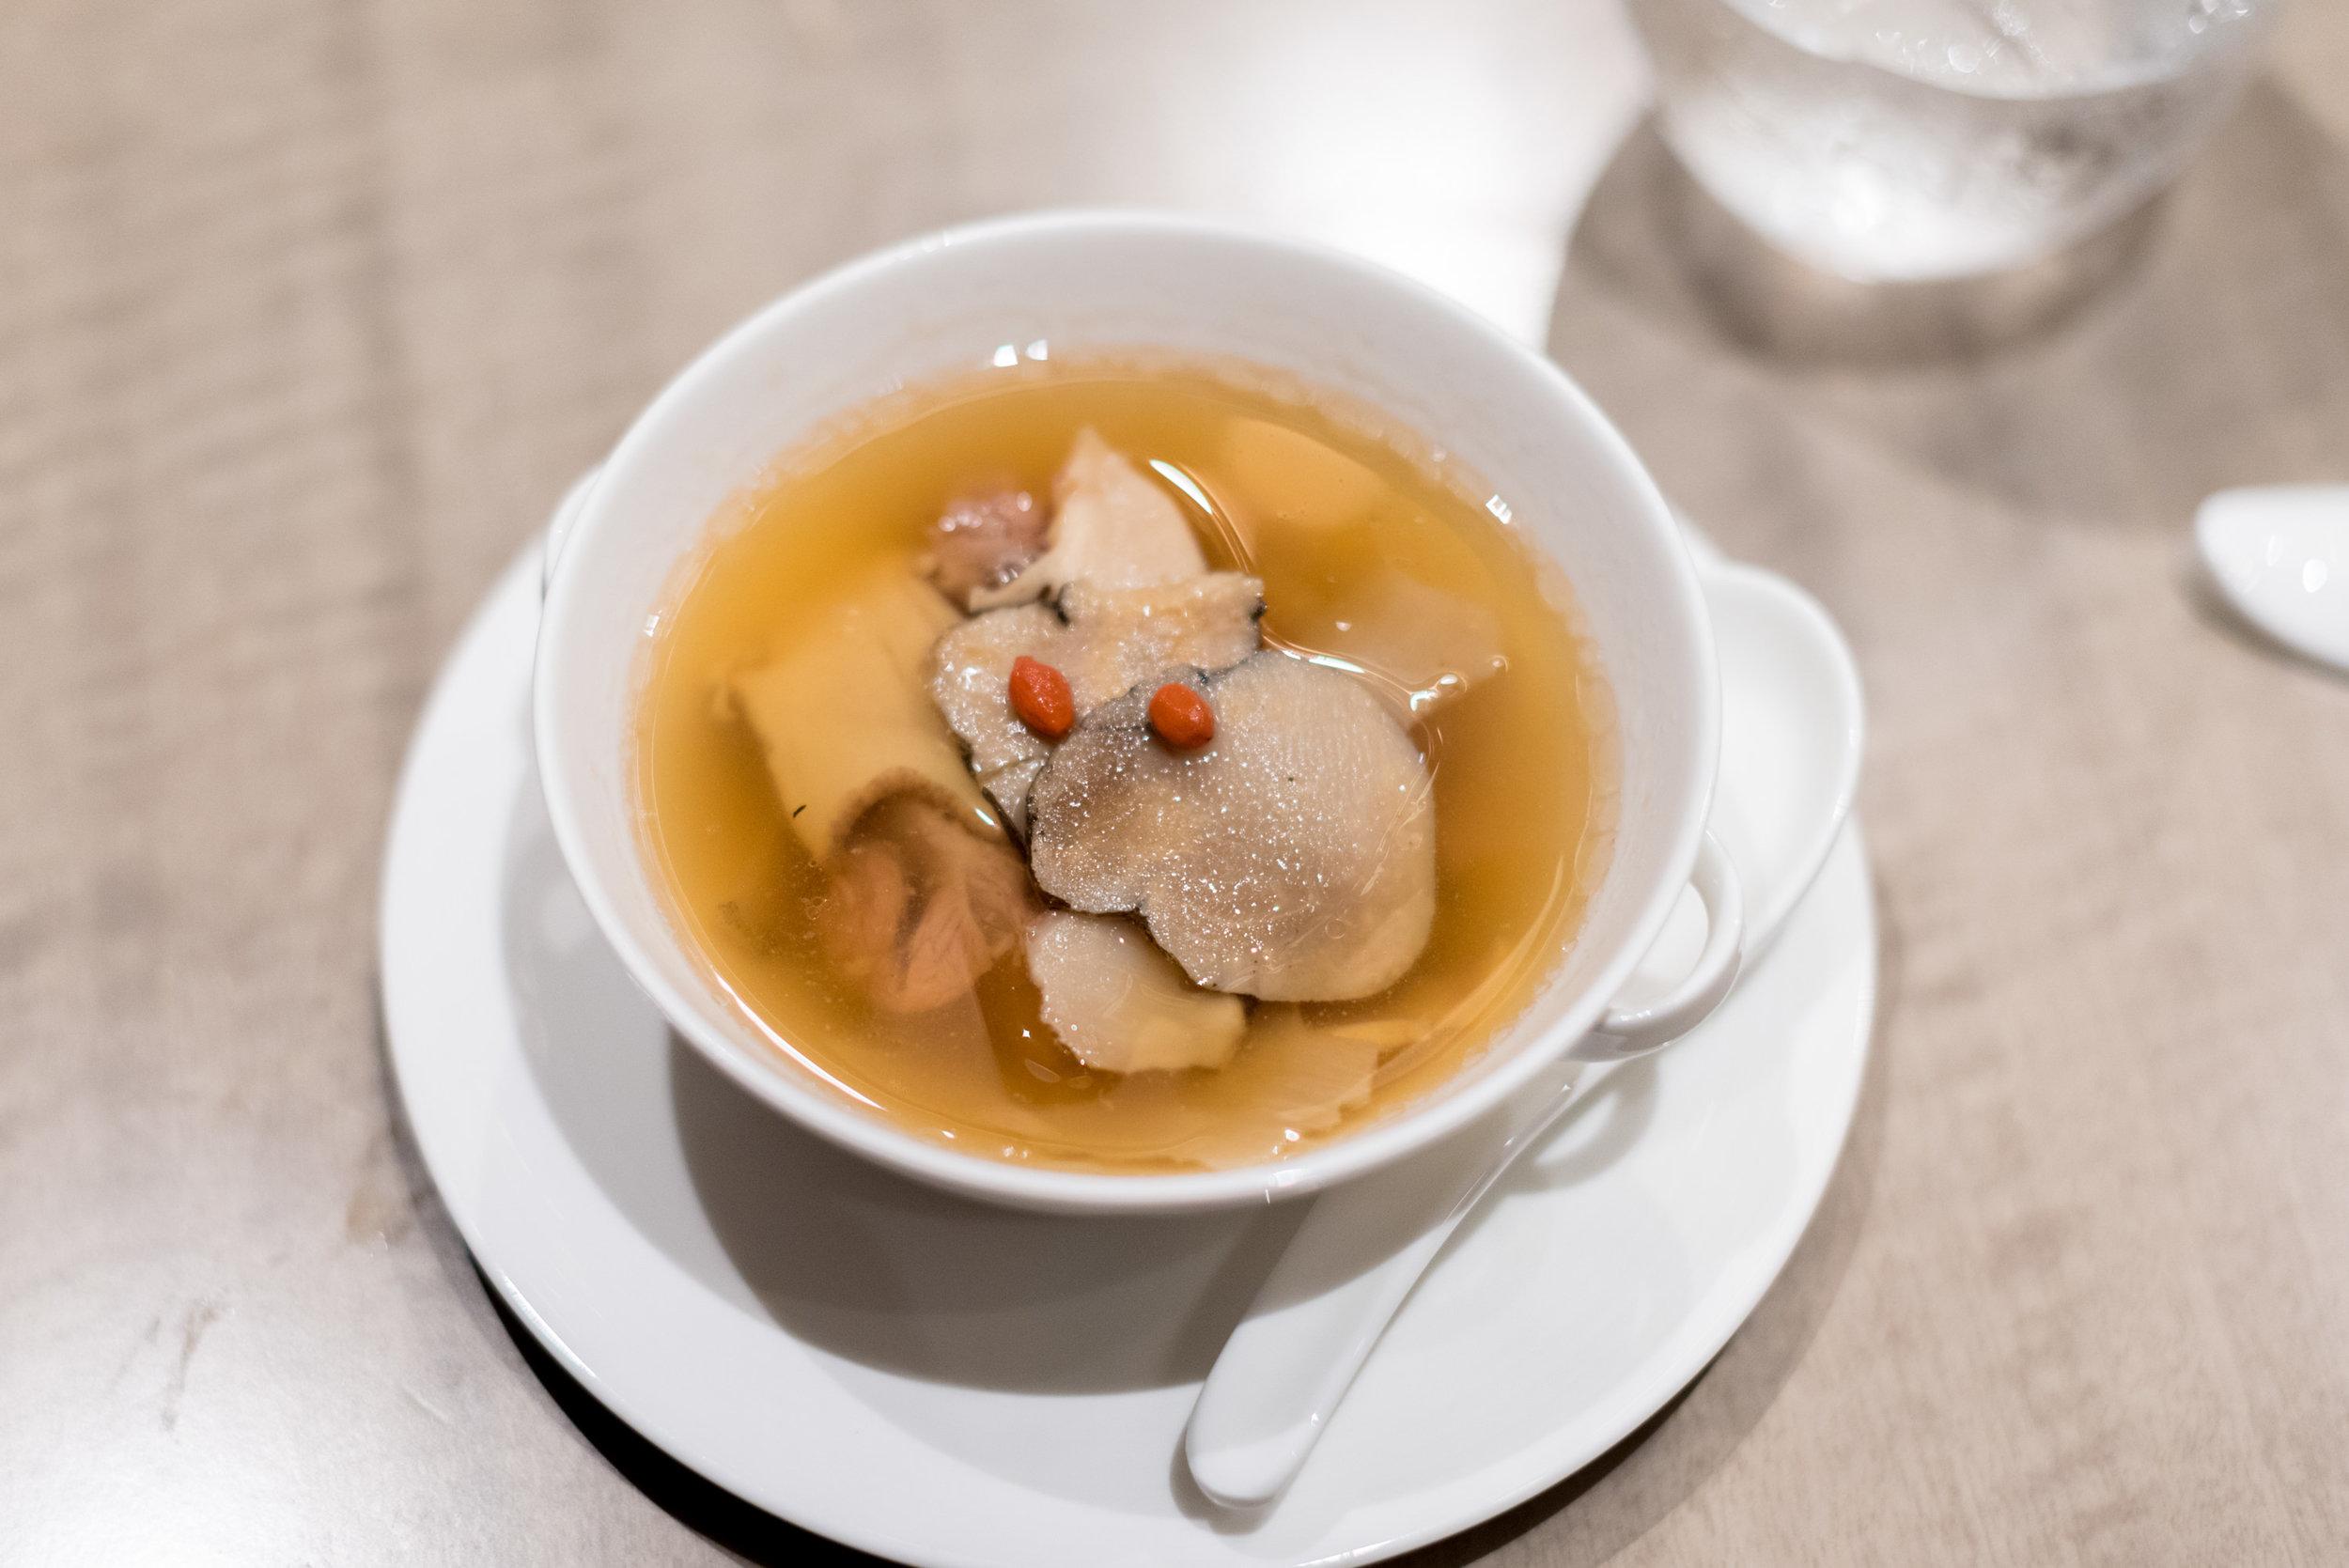 Double-Boiled Pork Ribs Soup with Sea Whelk, Maka and Dried Scallops  Jiang-Nan Chun - Four Seasons Hotel Singapore